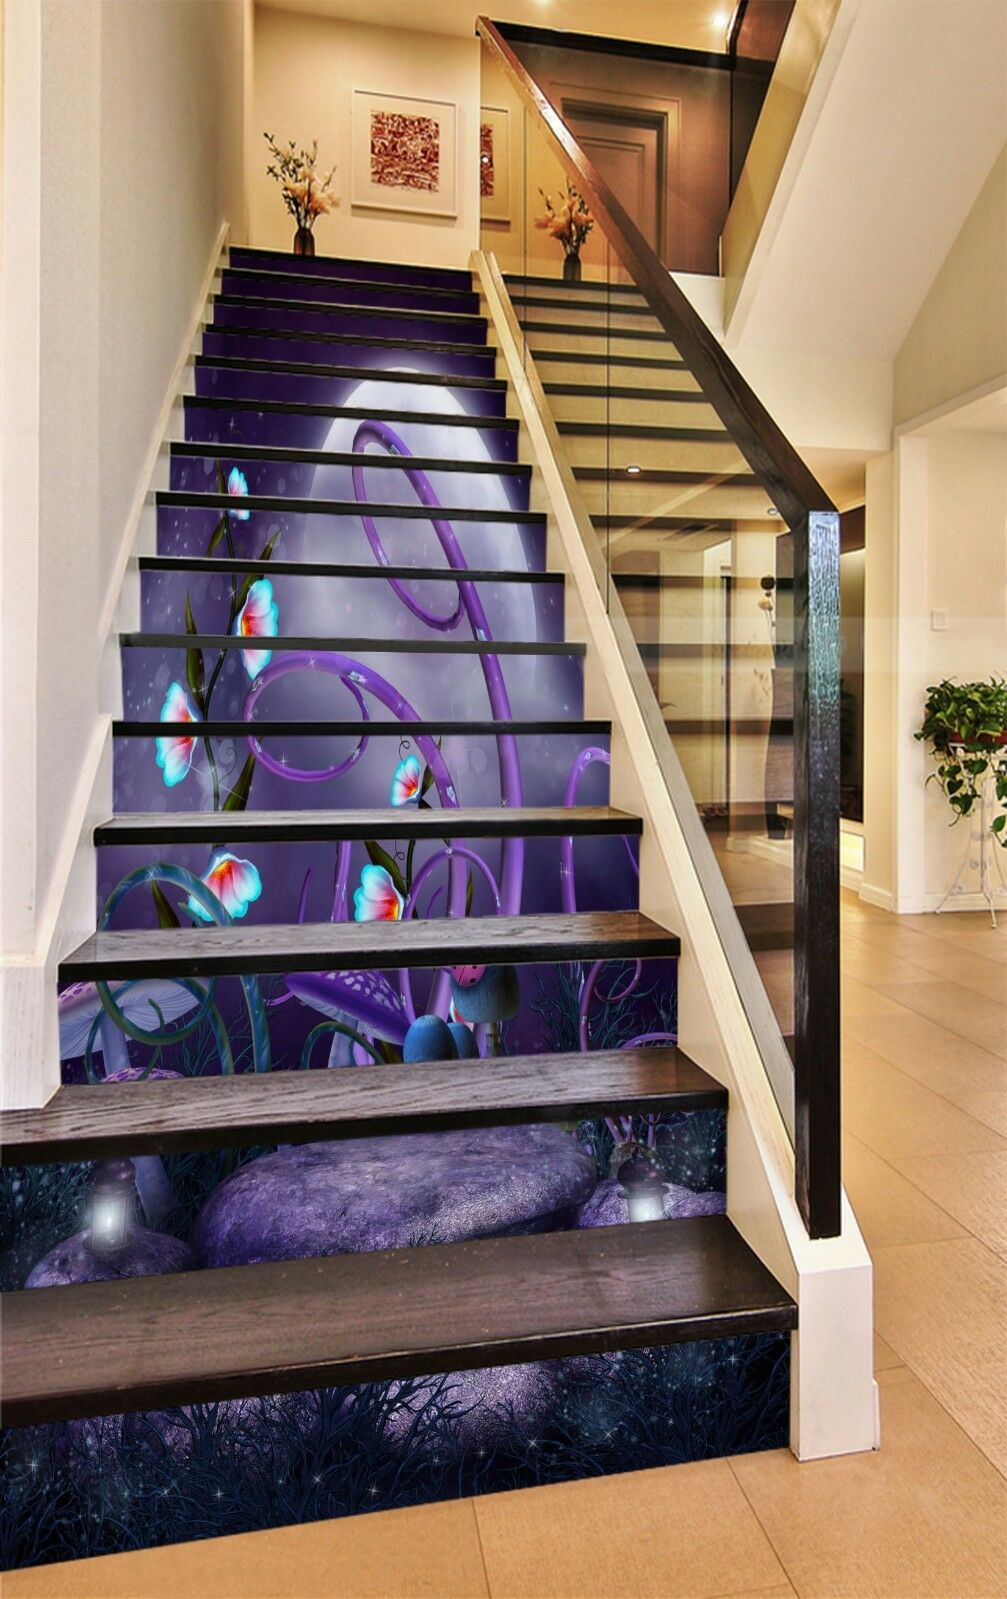 3D Moon plant 57 Stair Risers Decoration Photo Mural Vinyl Decal Wallpaper UK